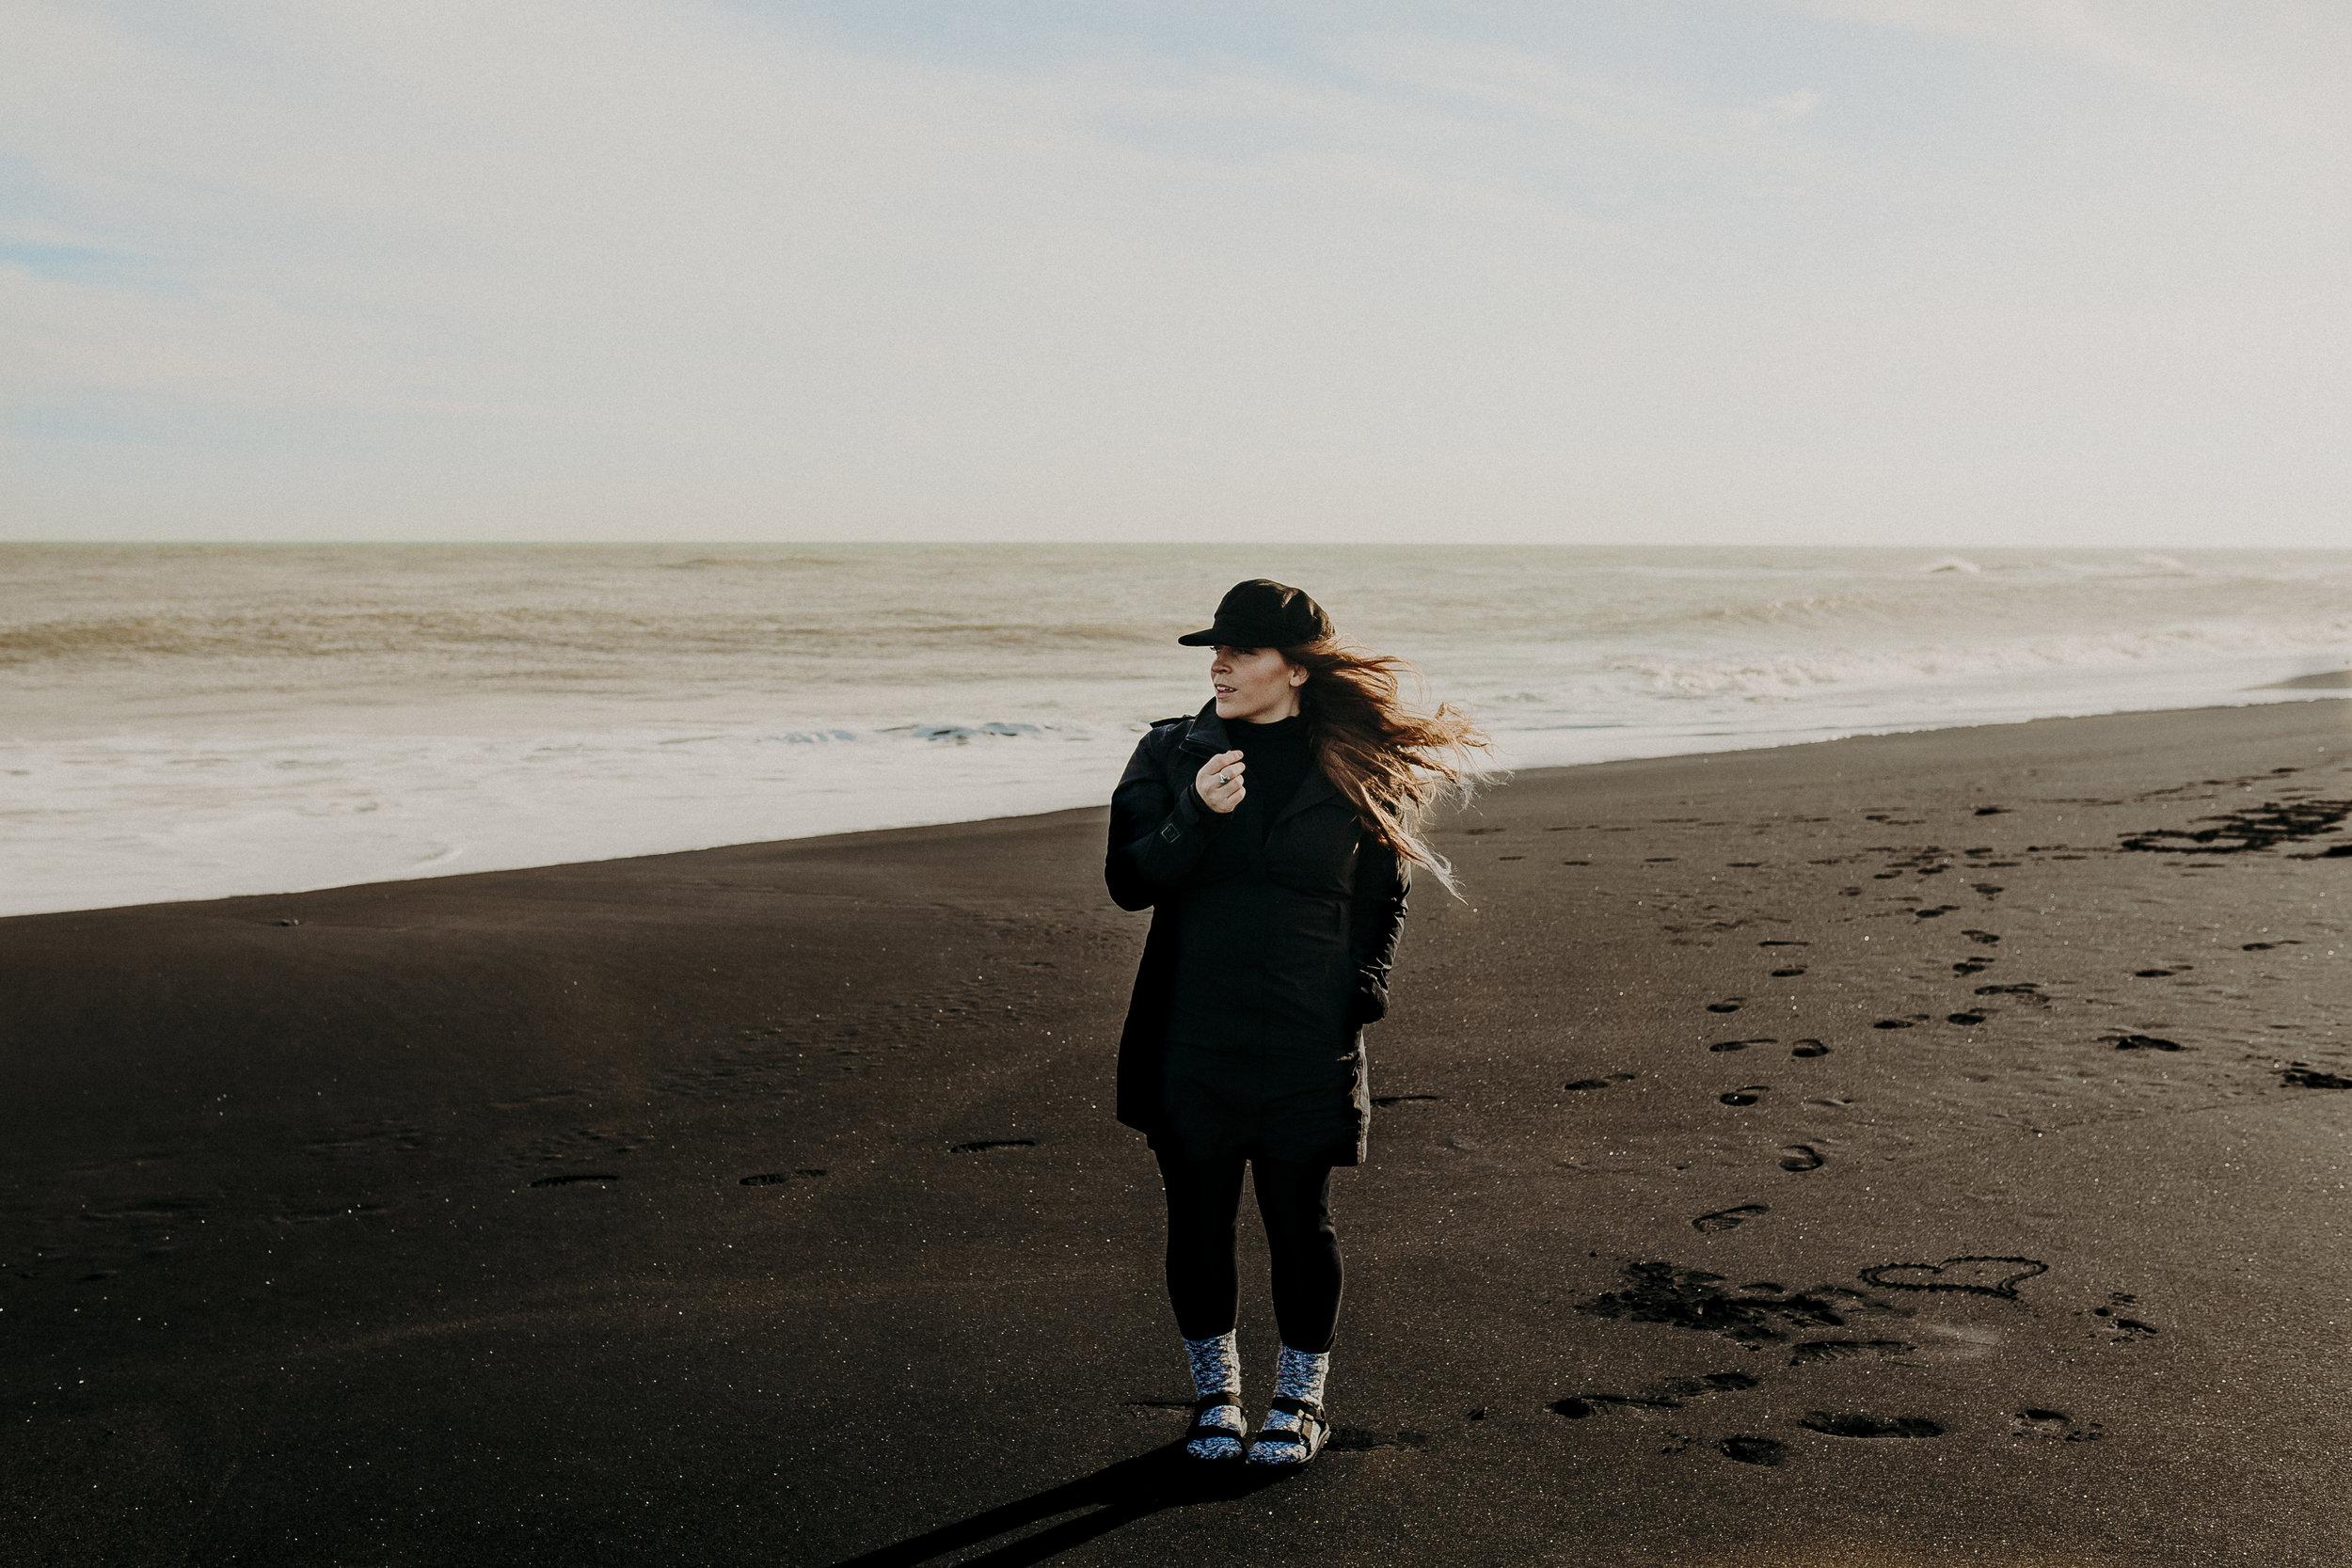 new-zealand-black-sand-beaches-north-island-18.jpg